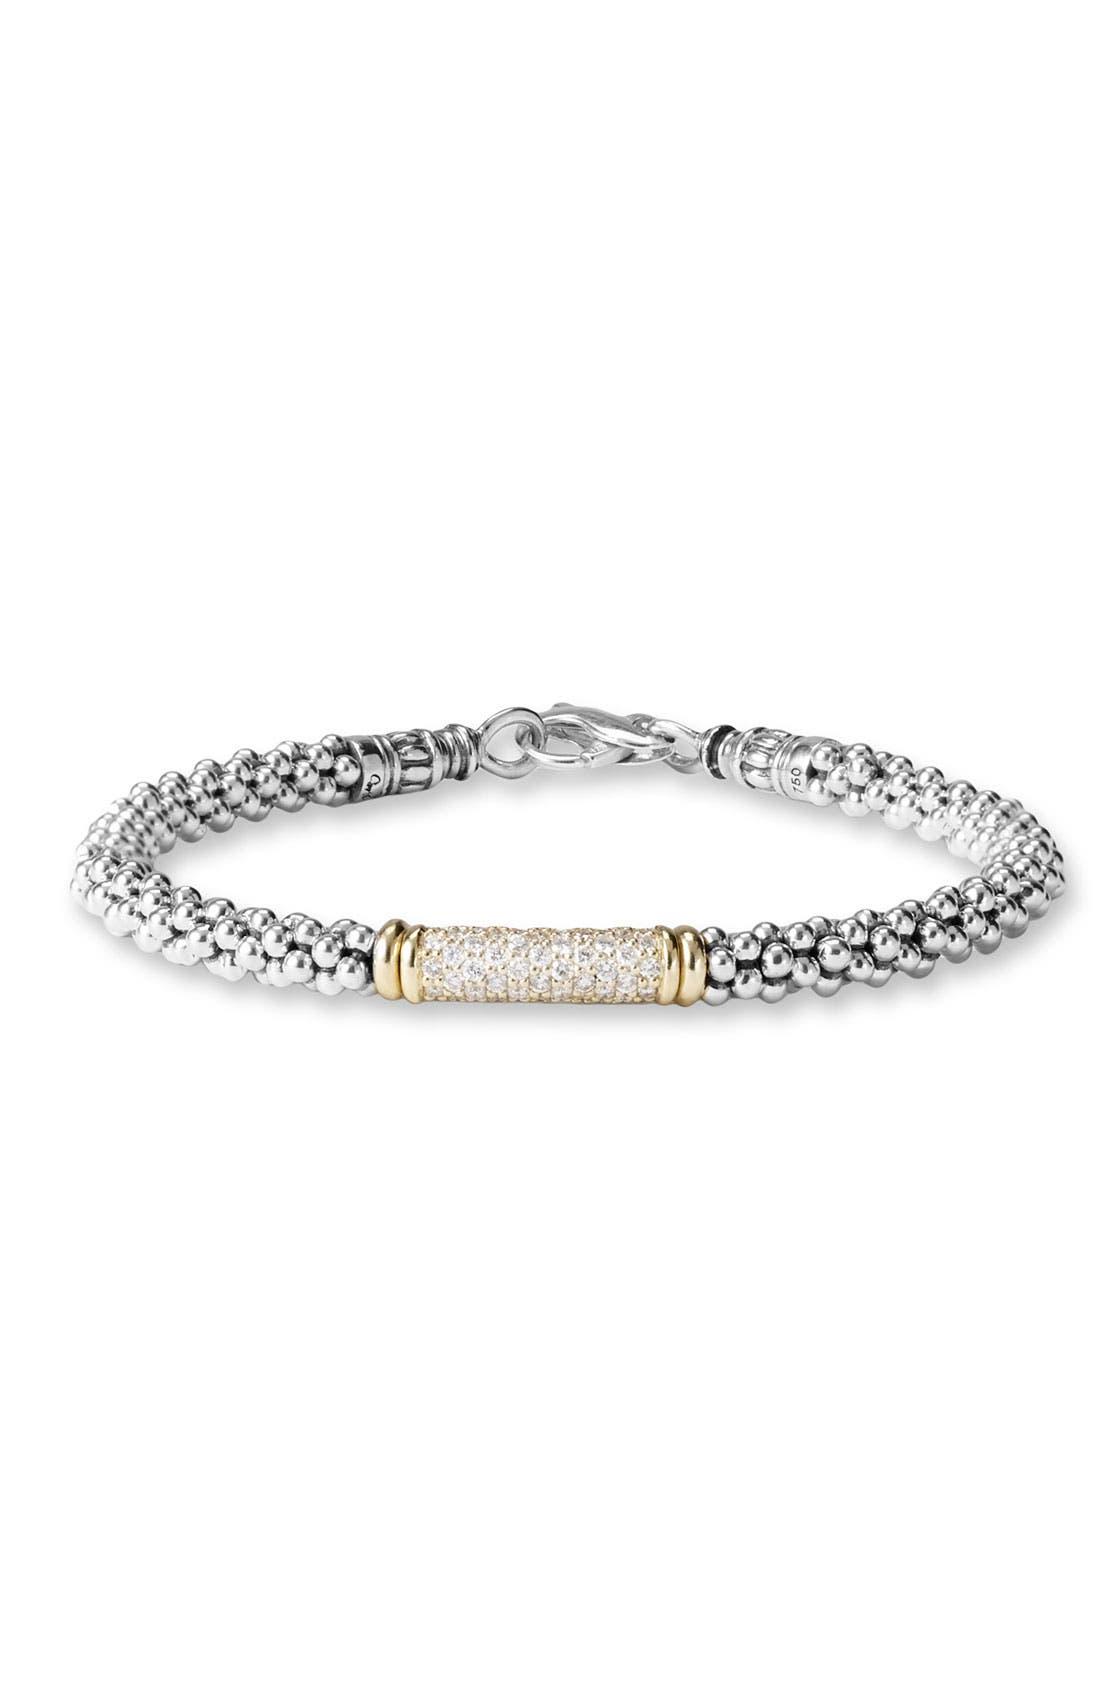 Alternate Image 1 Selected - LAGOS Caviar Rope Bracelet